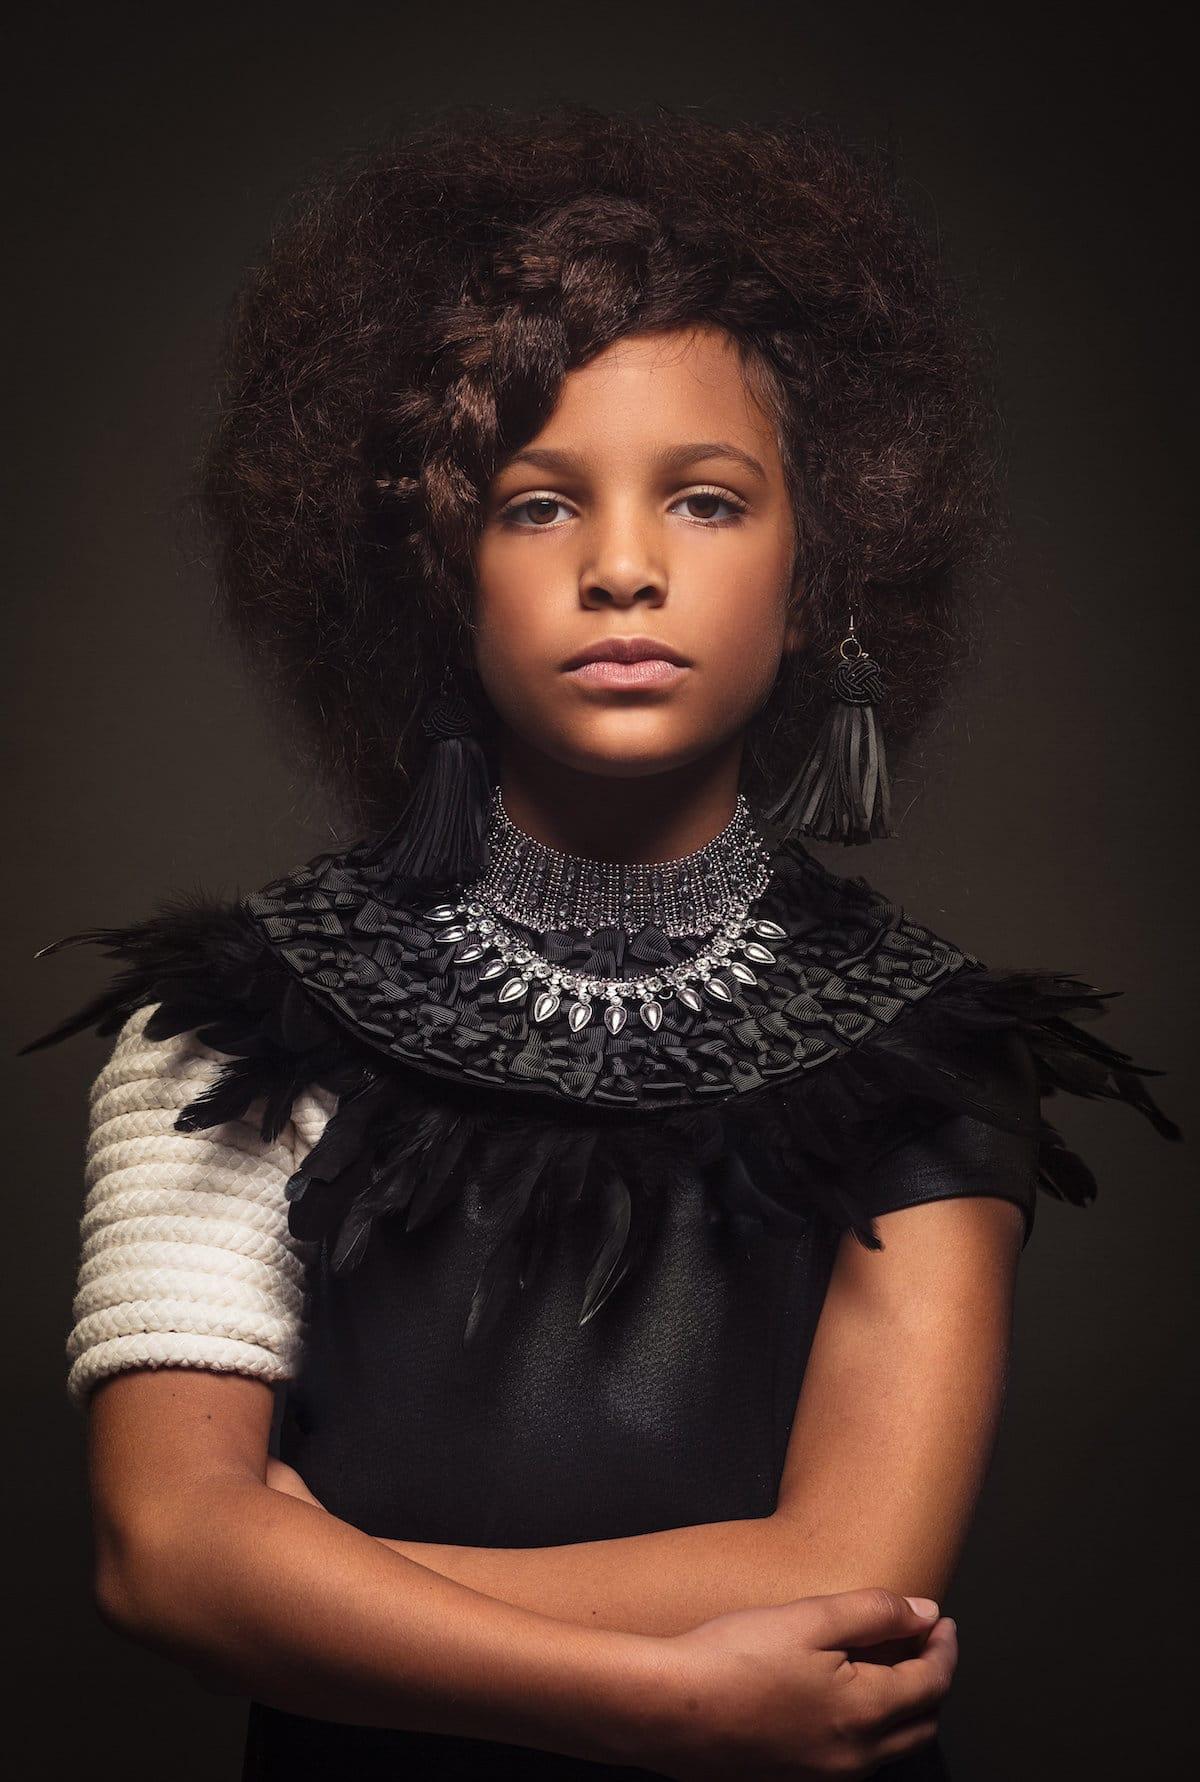 Afro-art-creative-soul-photography-5.jpg